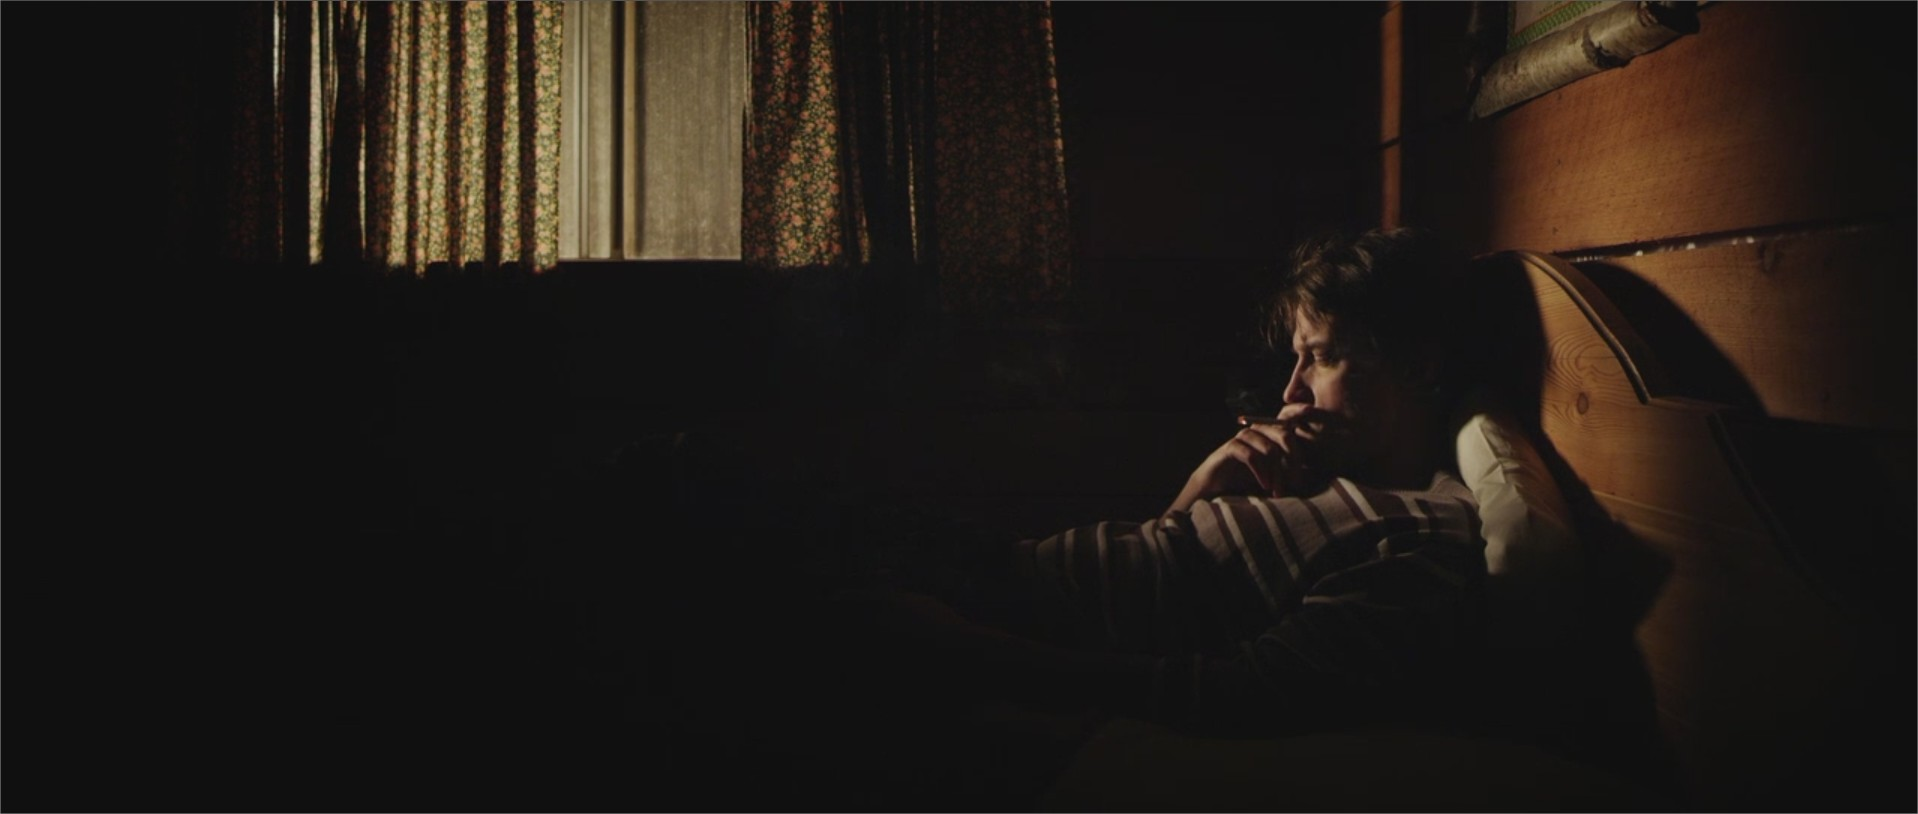 Black Mountain Side - Critique du film de Nick Szostakiwskyj